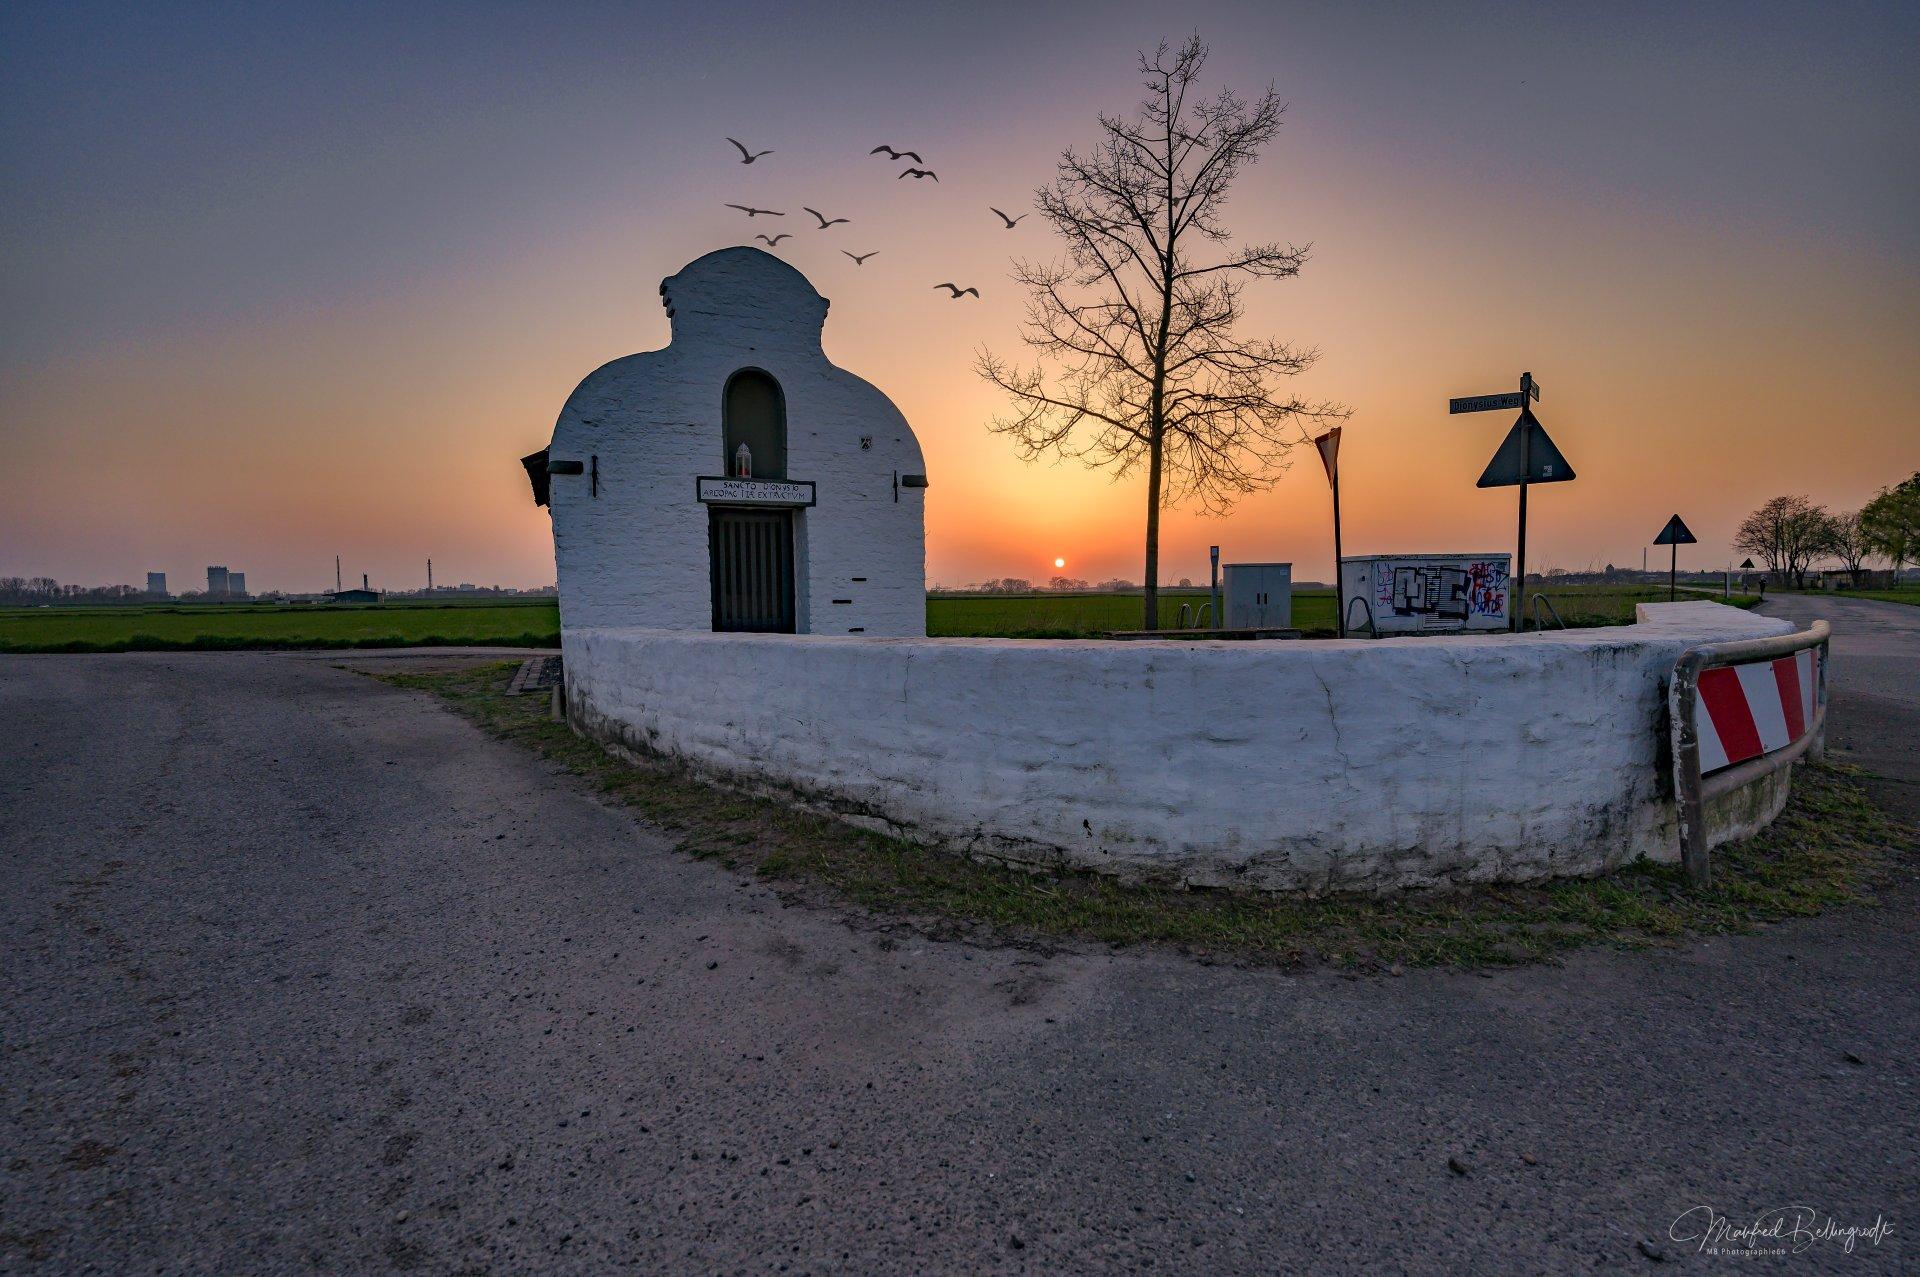 Sonnenuntergang Serm, Kapelle